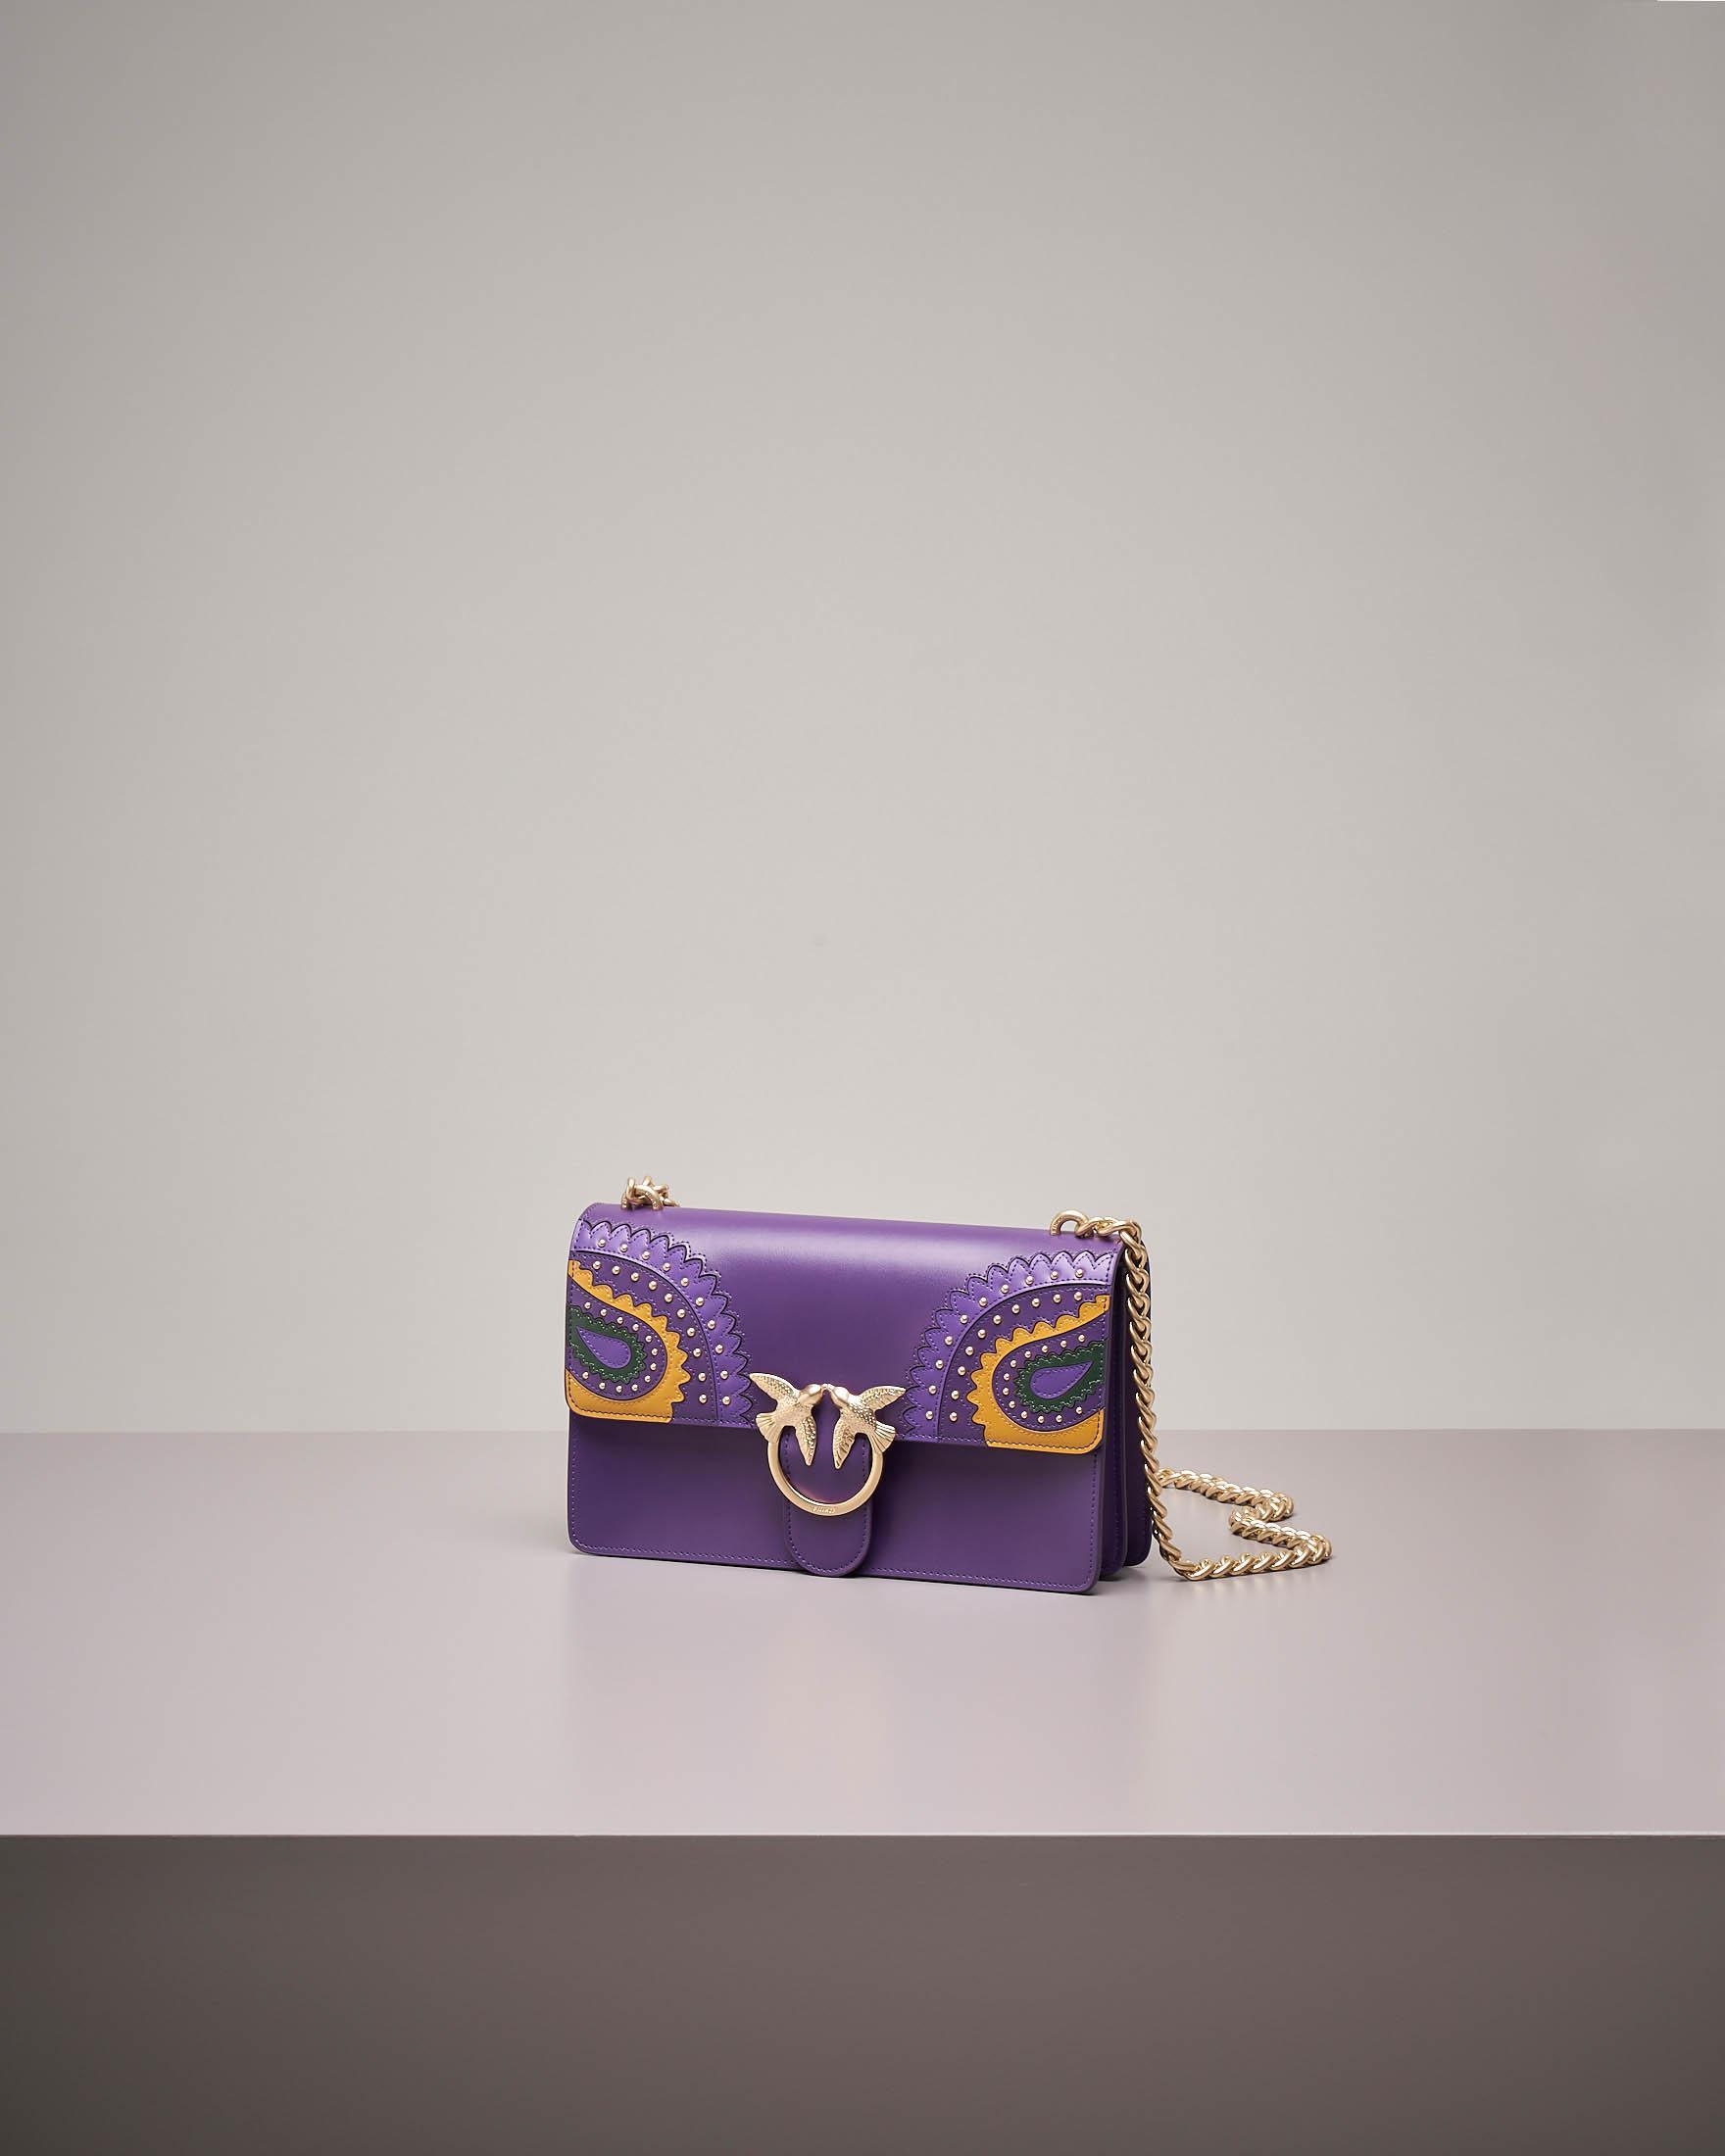 Love Bag Paislay: borsa tracolla con intarsi e borchie